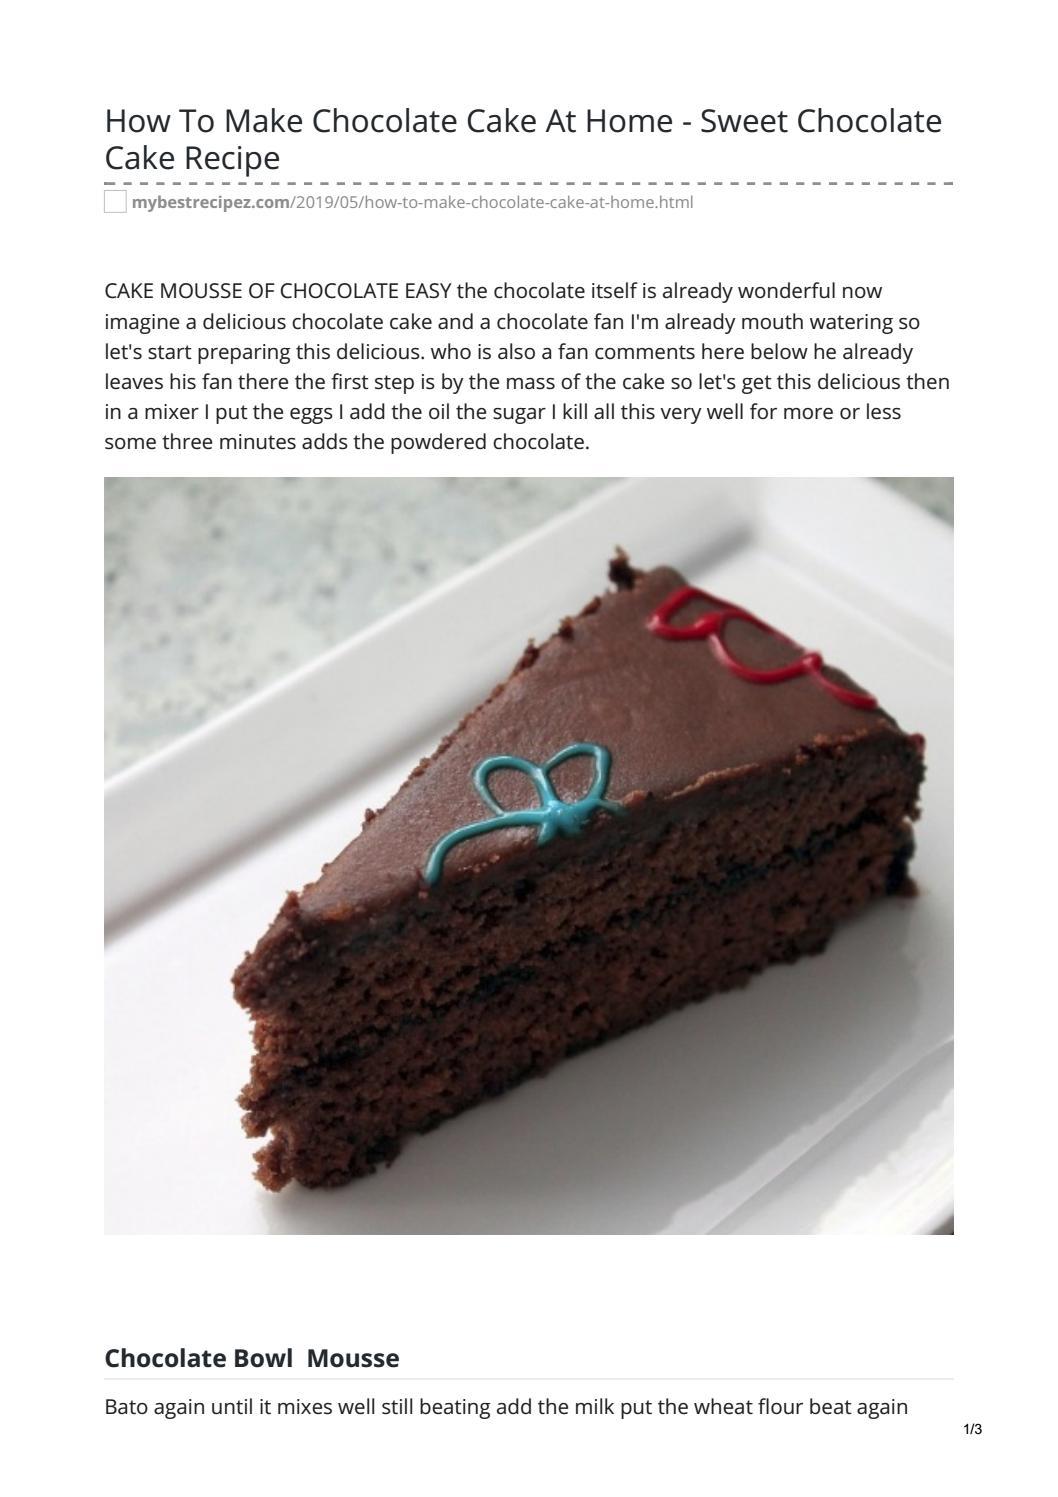 How To Make Chocolate Cake At Home - Sweet Chocolate Cake